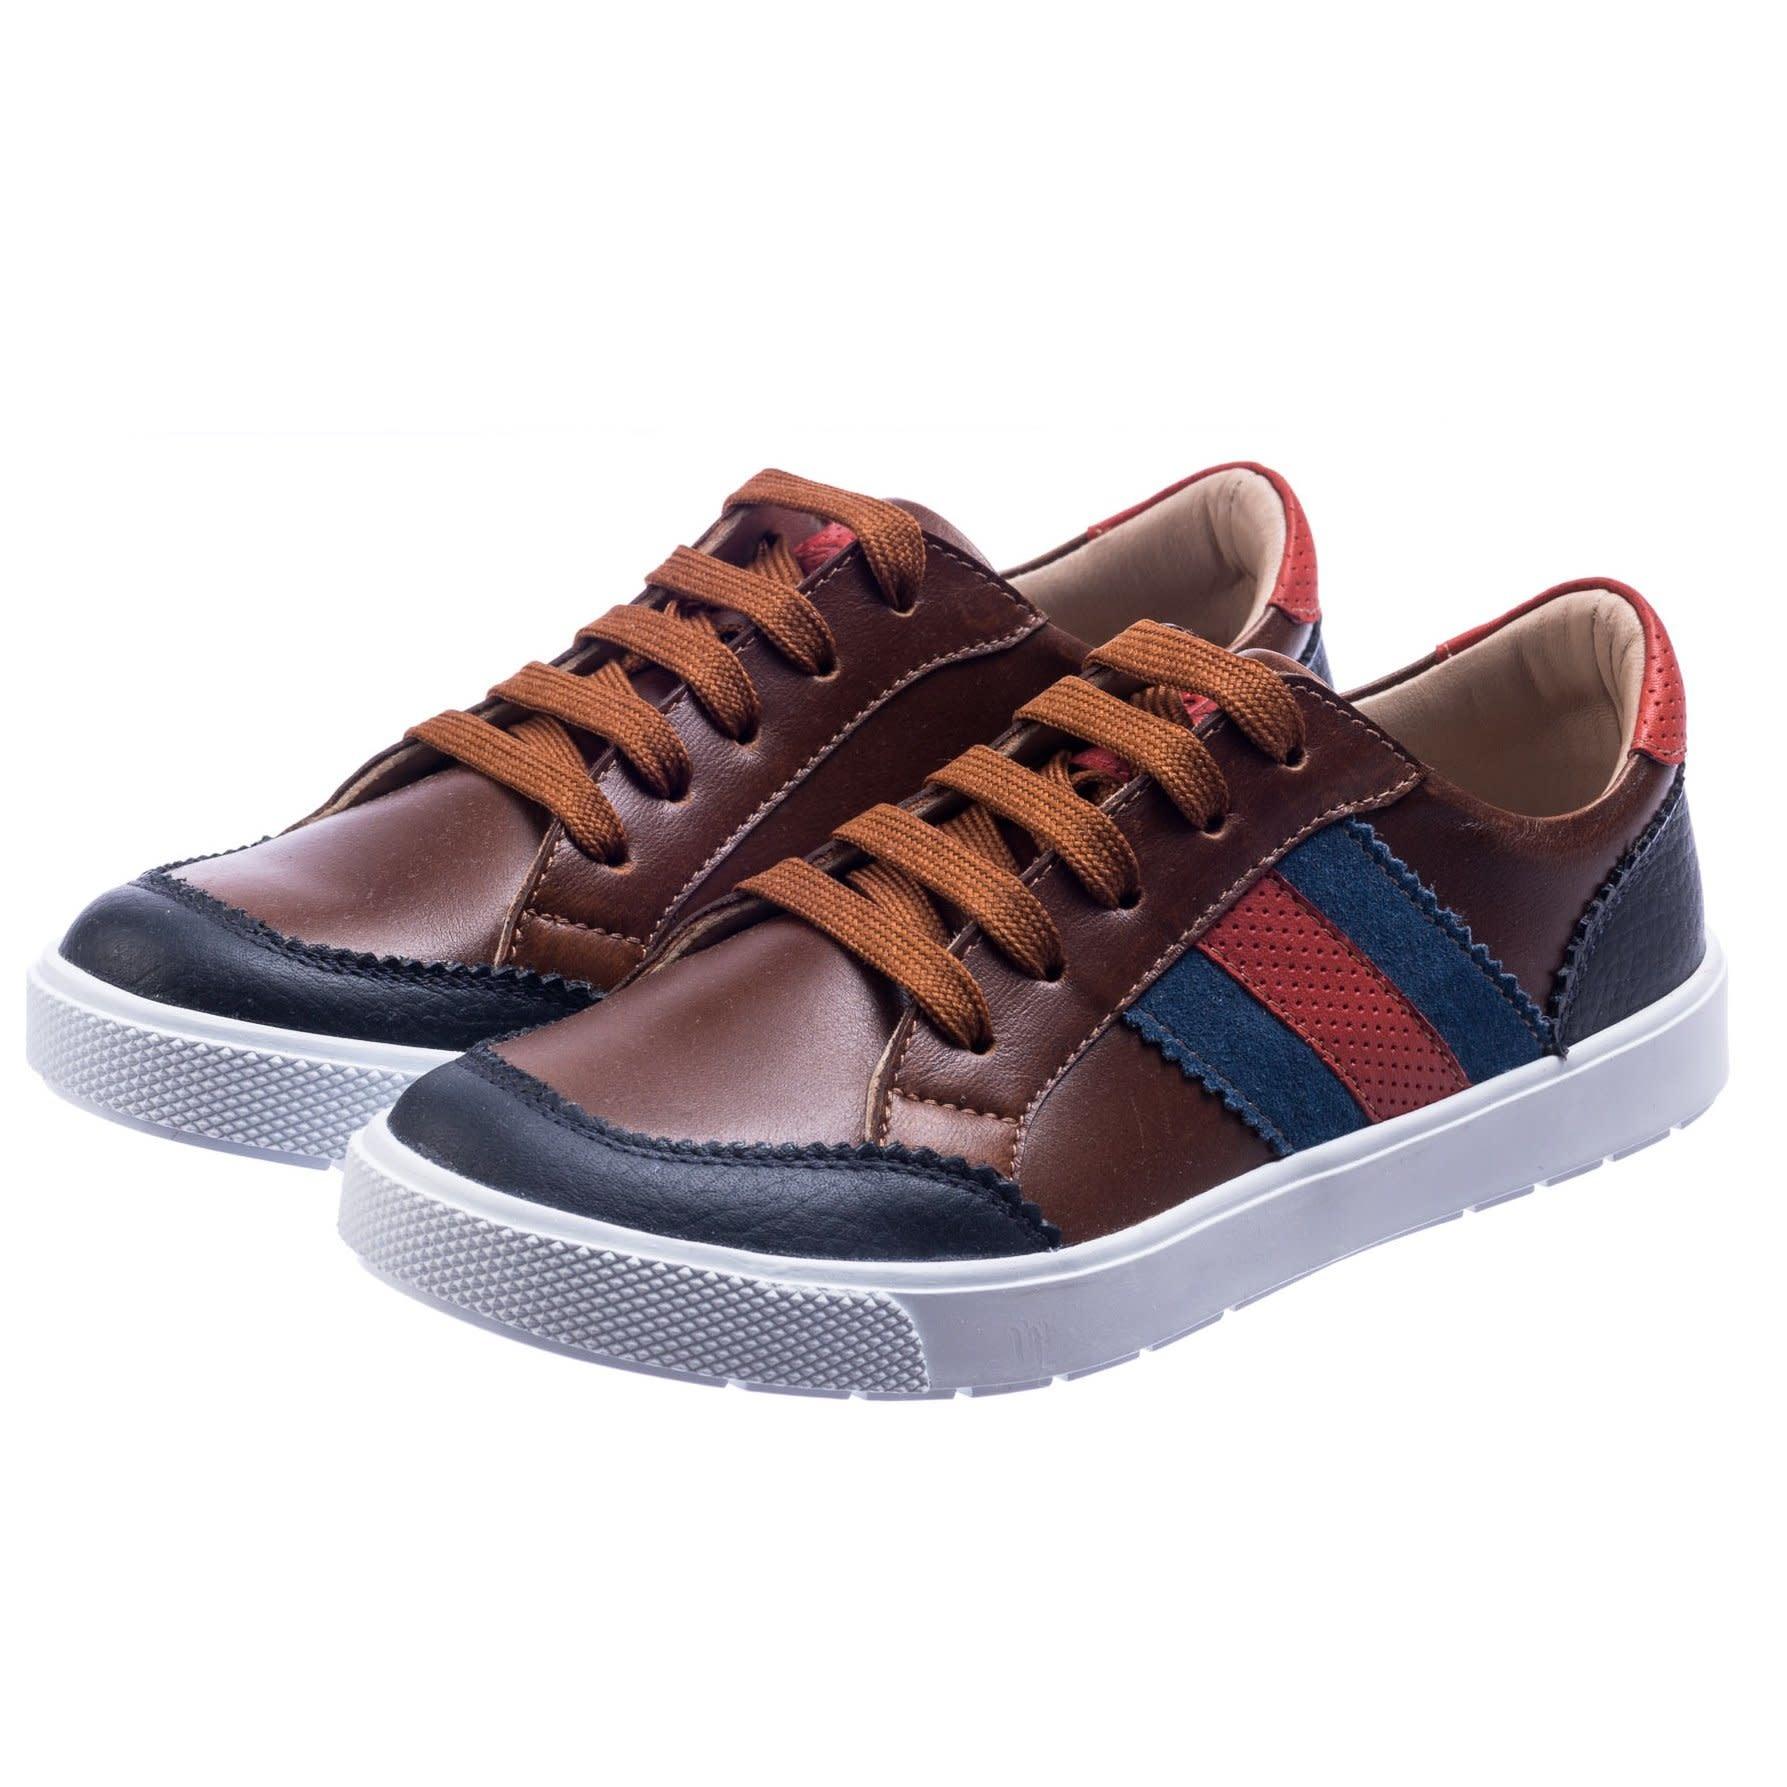 Elephantito All American Apache Sneaker